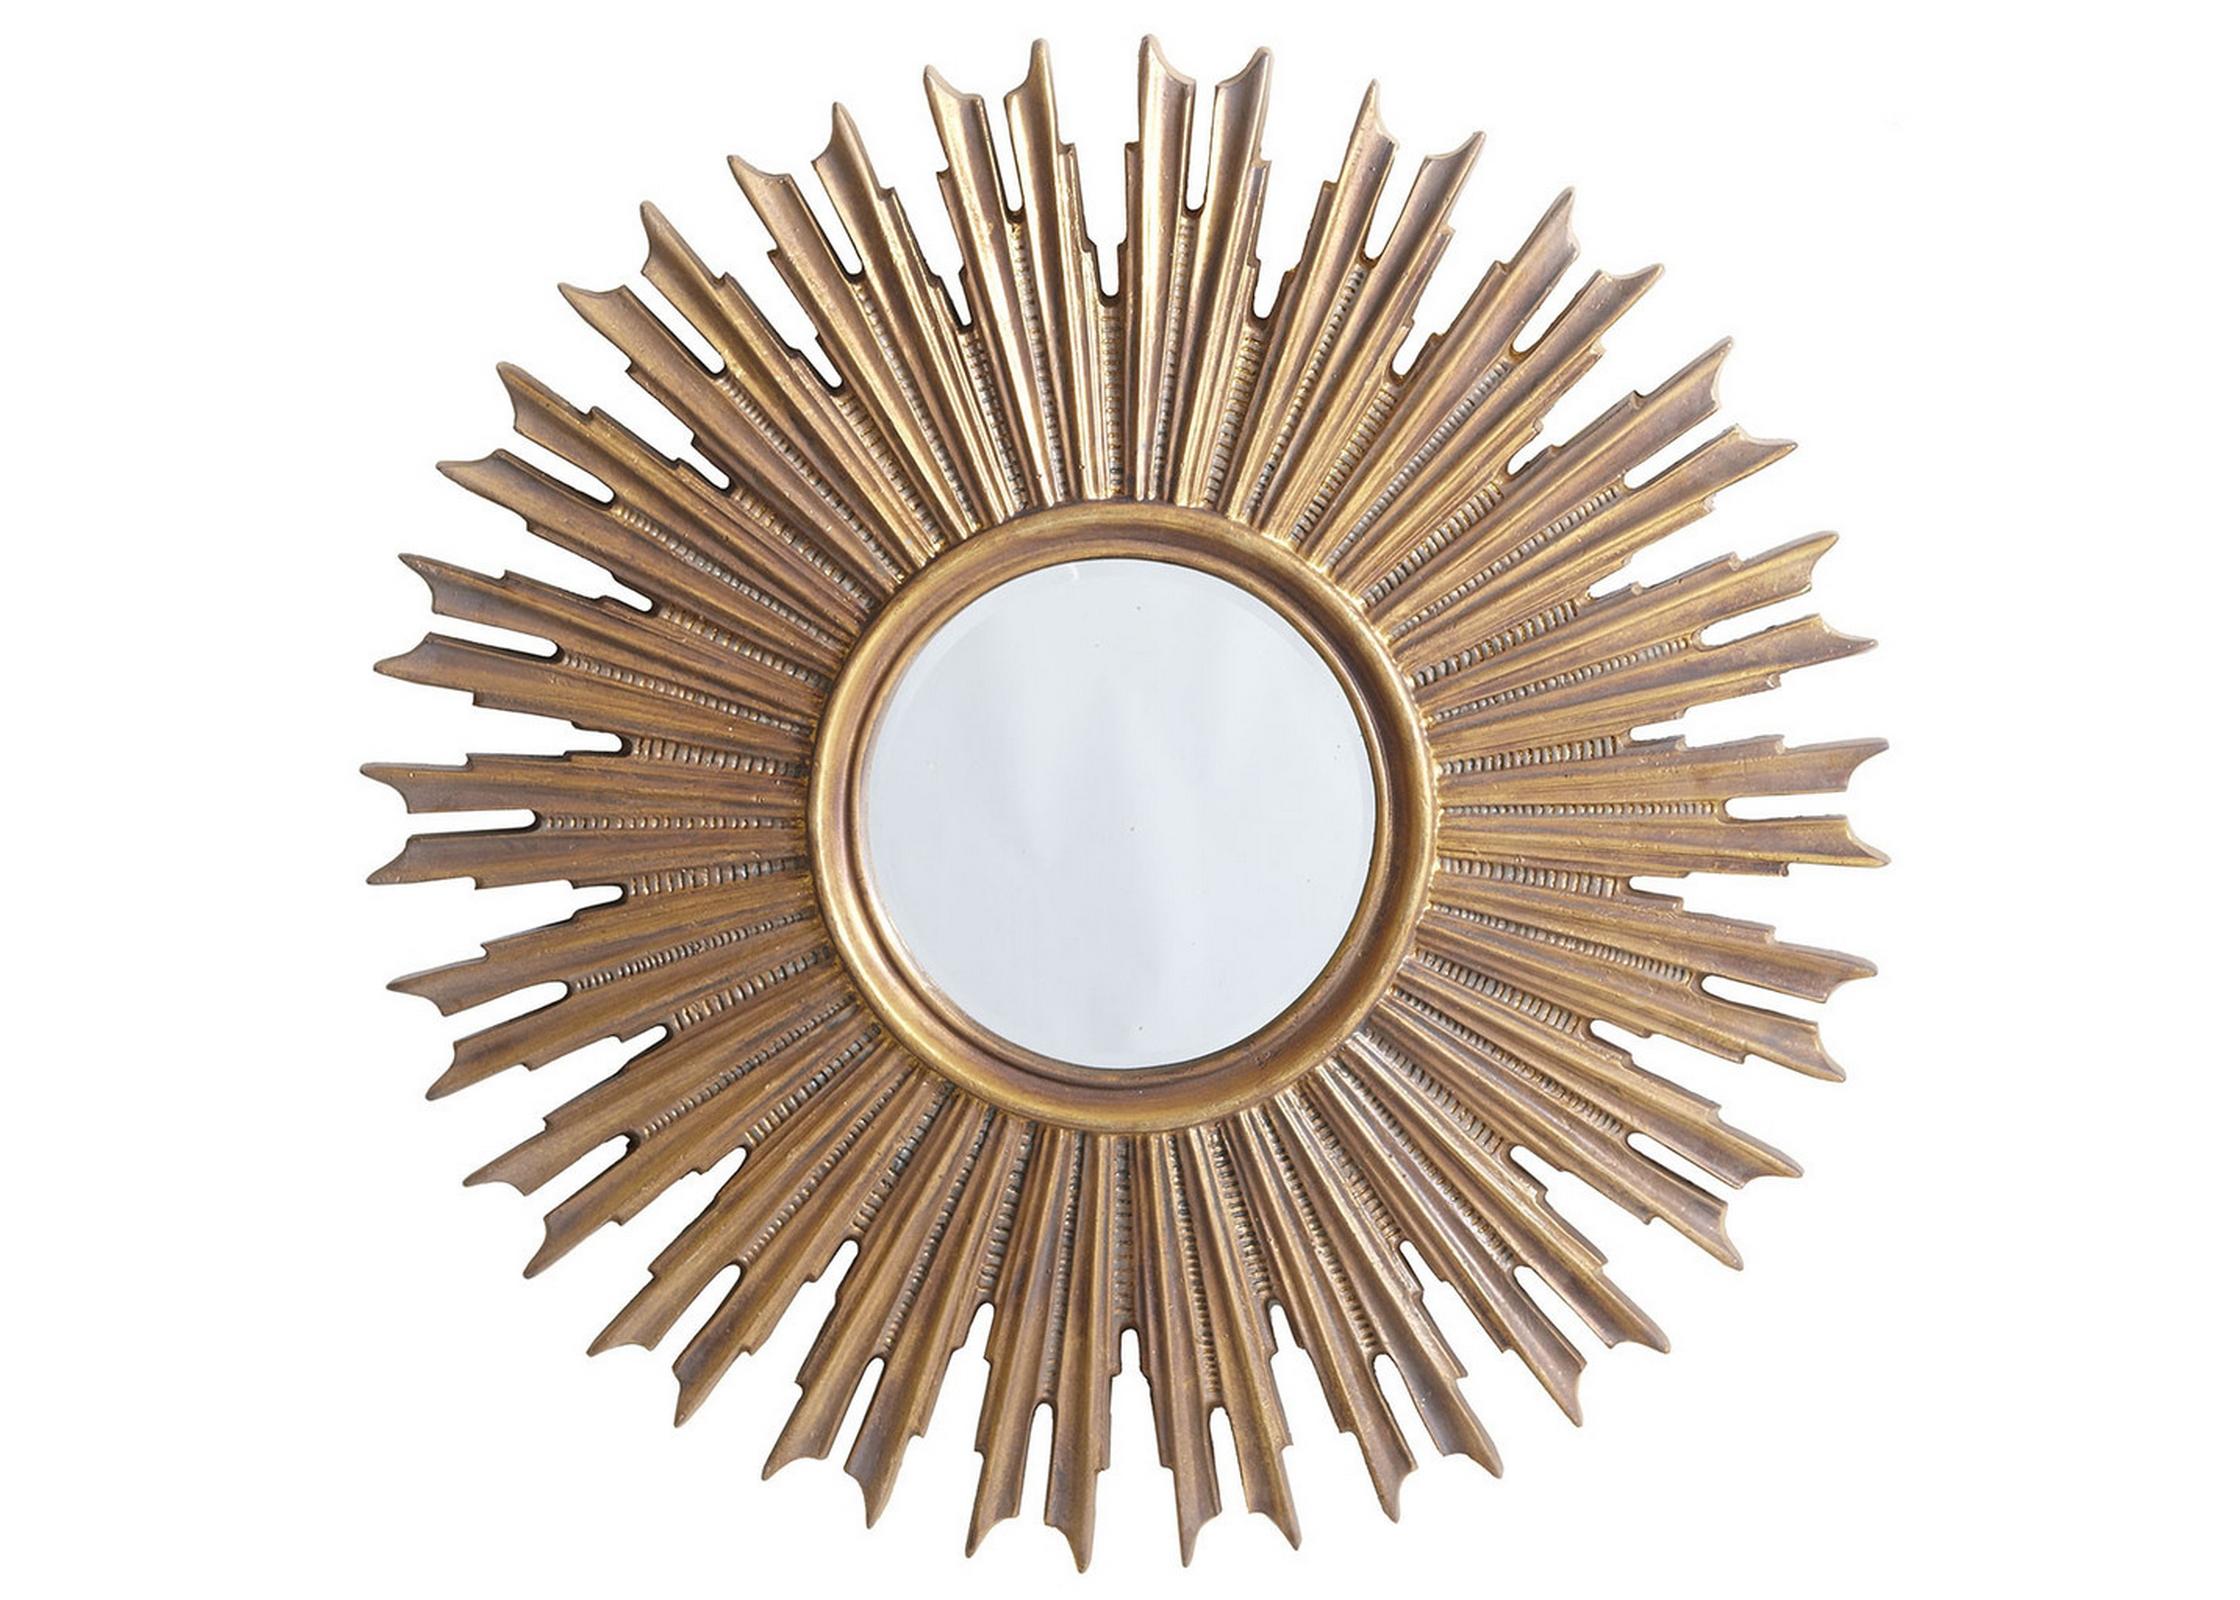 Зеркало ЭллисонНастенные зеркала<br>Материал: дерево, полиуретан.<br><br>Material: Пластик<br>Глубина см: 3